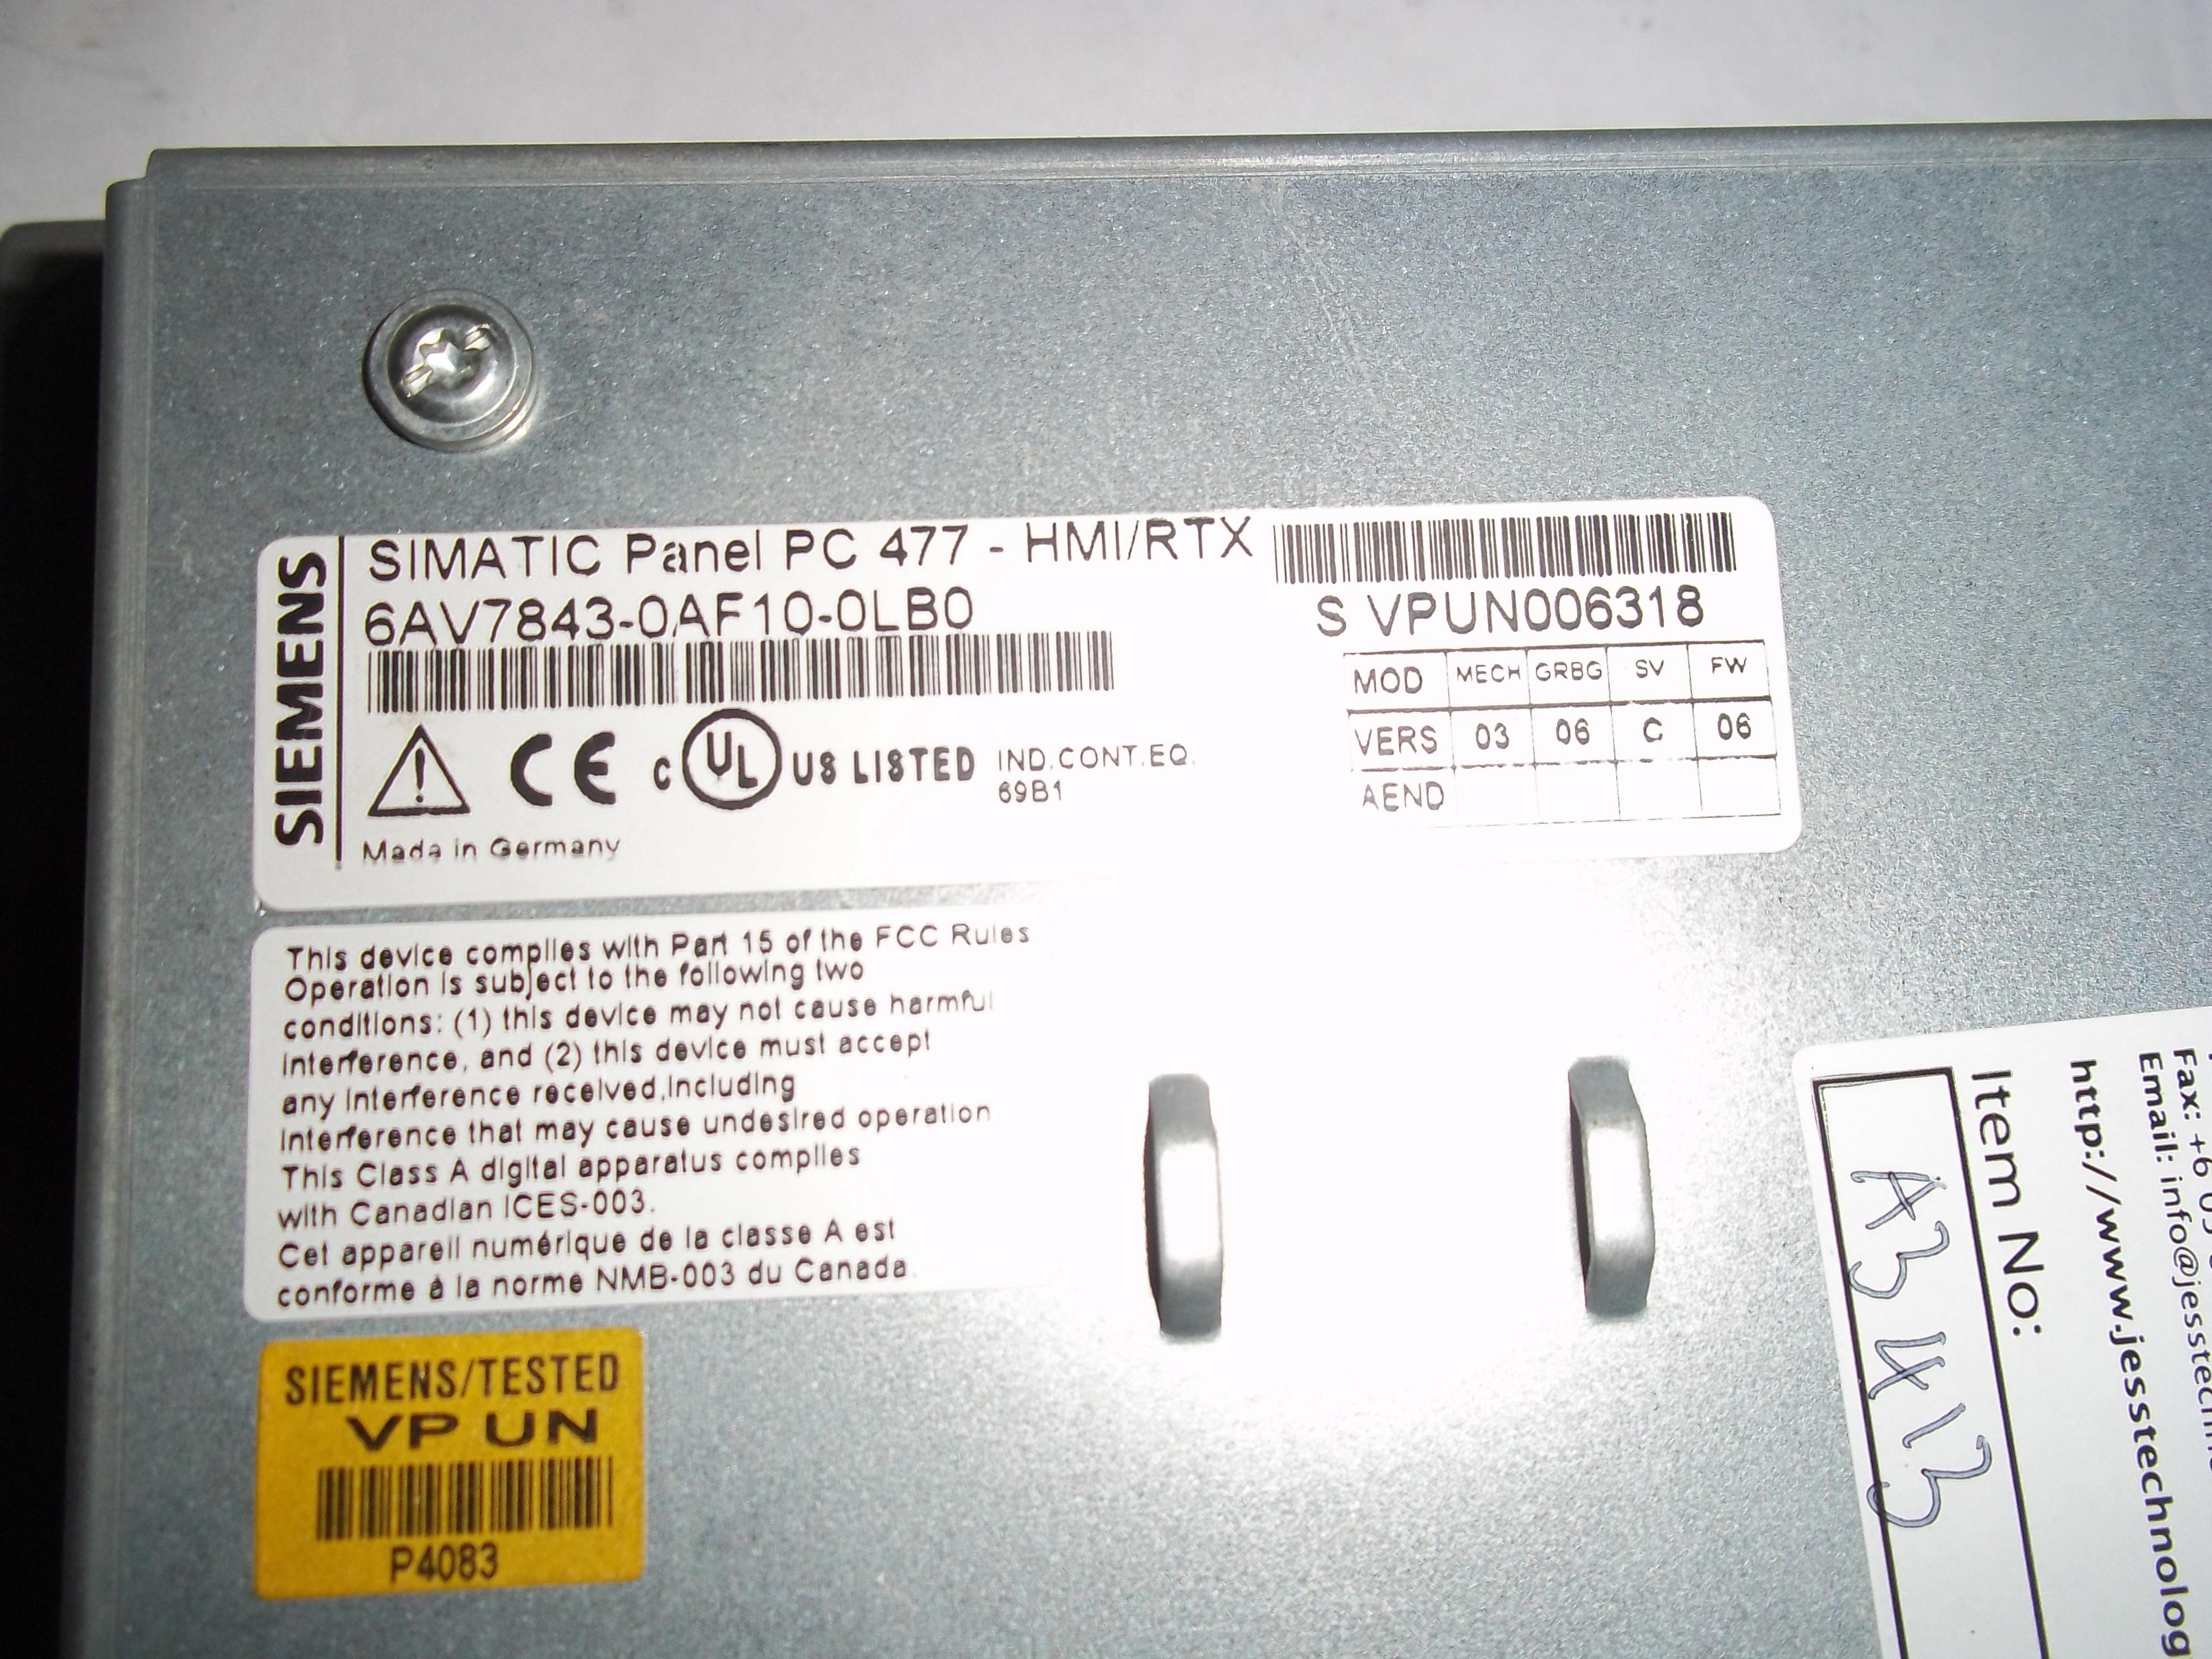 Repair 6AV7843-0AF10-0LB0 SIEMENS  SIEMENS SIMATIC PANEL PC (6AV7843-0AF10-0LB0) in Malaysia, Singapore, Thailand, Indonesia